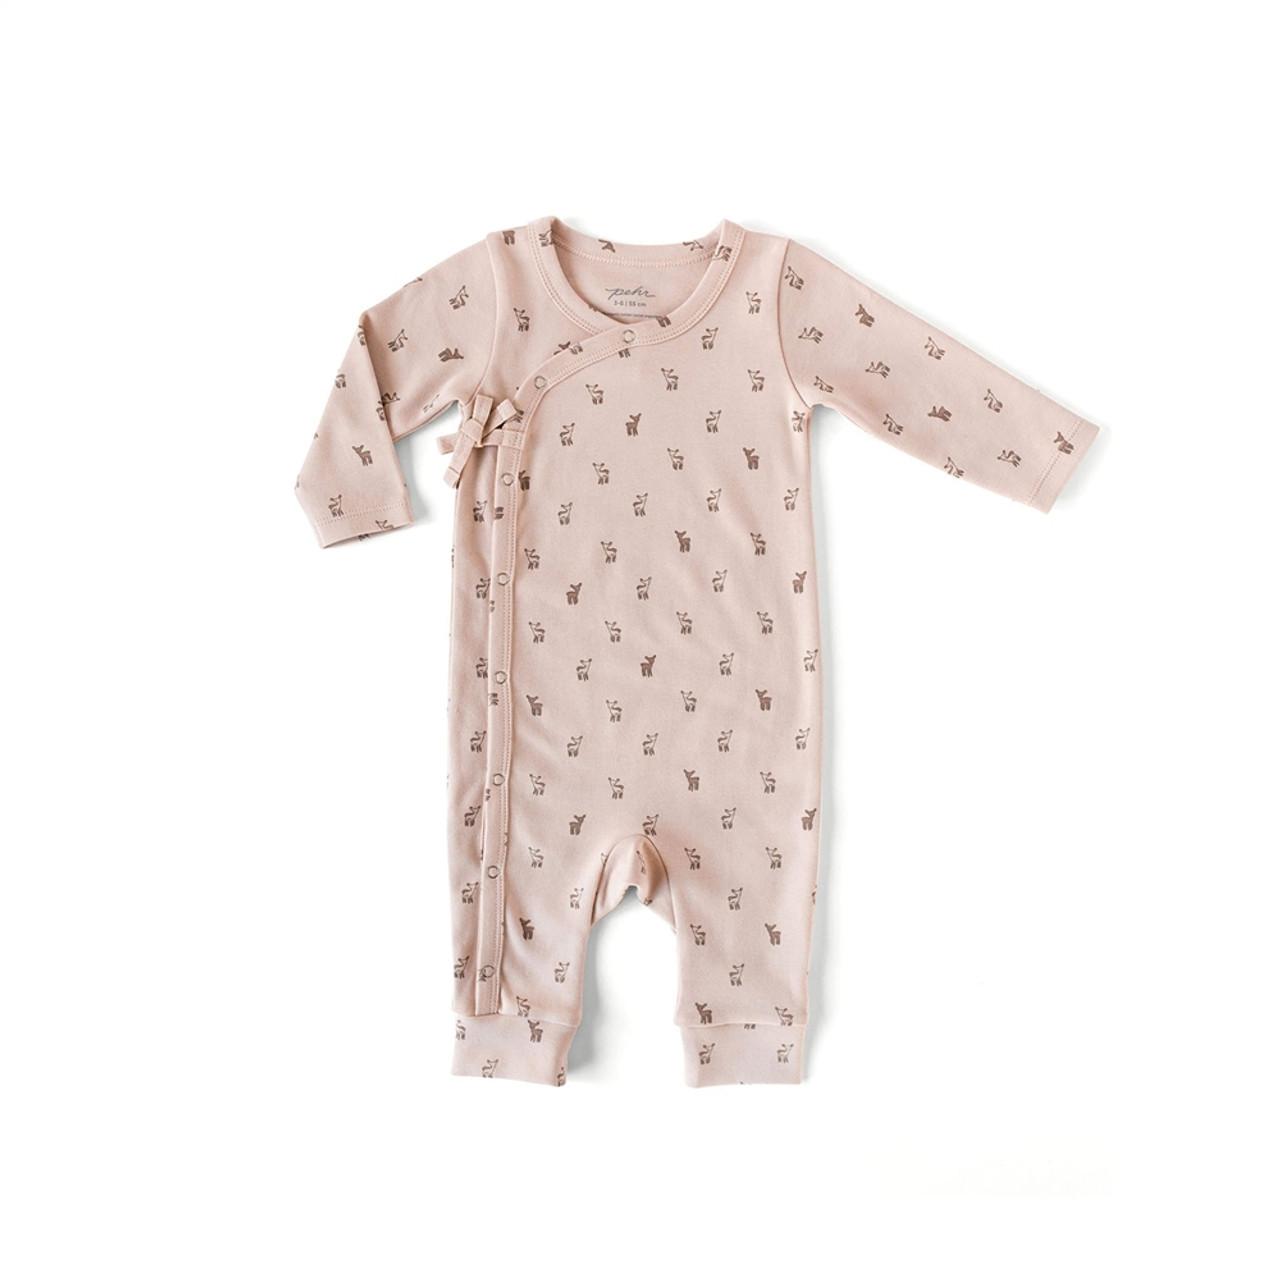 Organic Cotton Kimono Romper - Deer Print, 0-3m